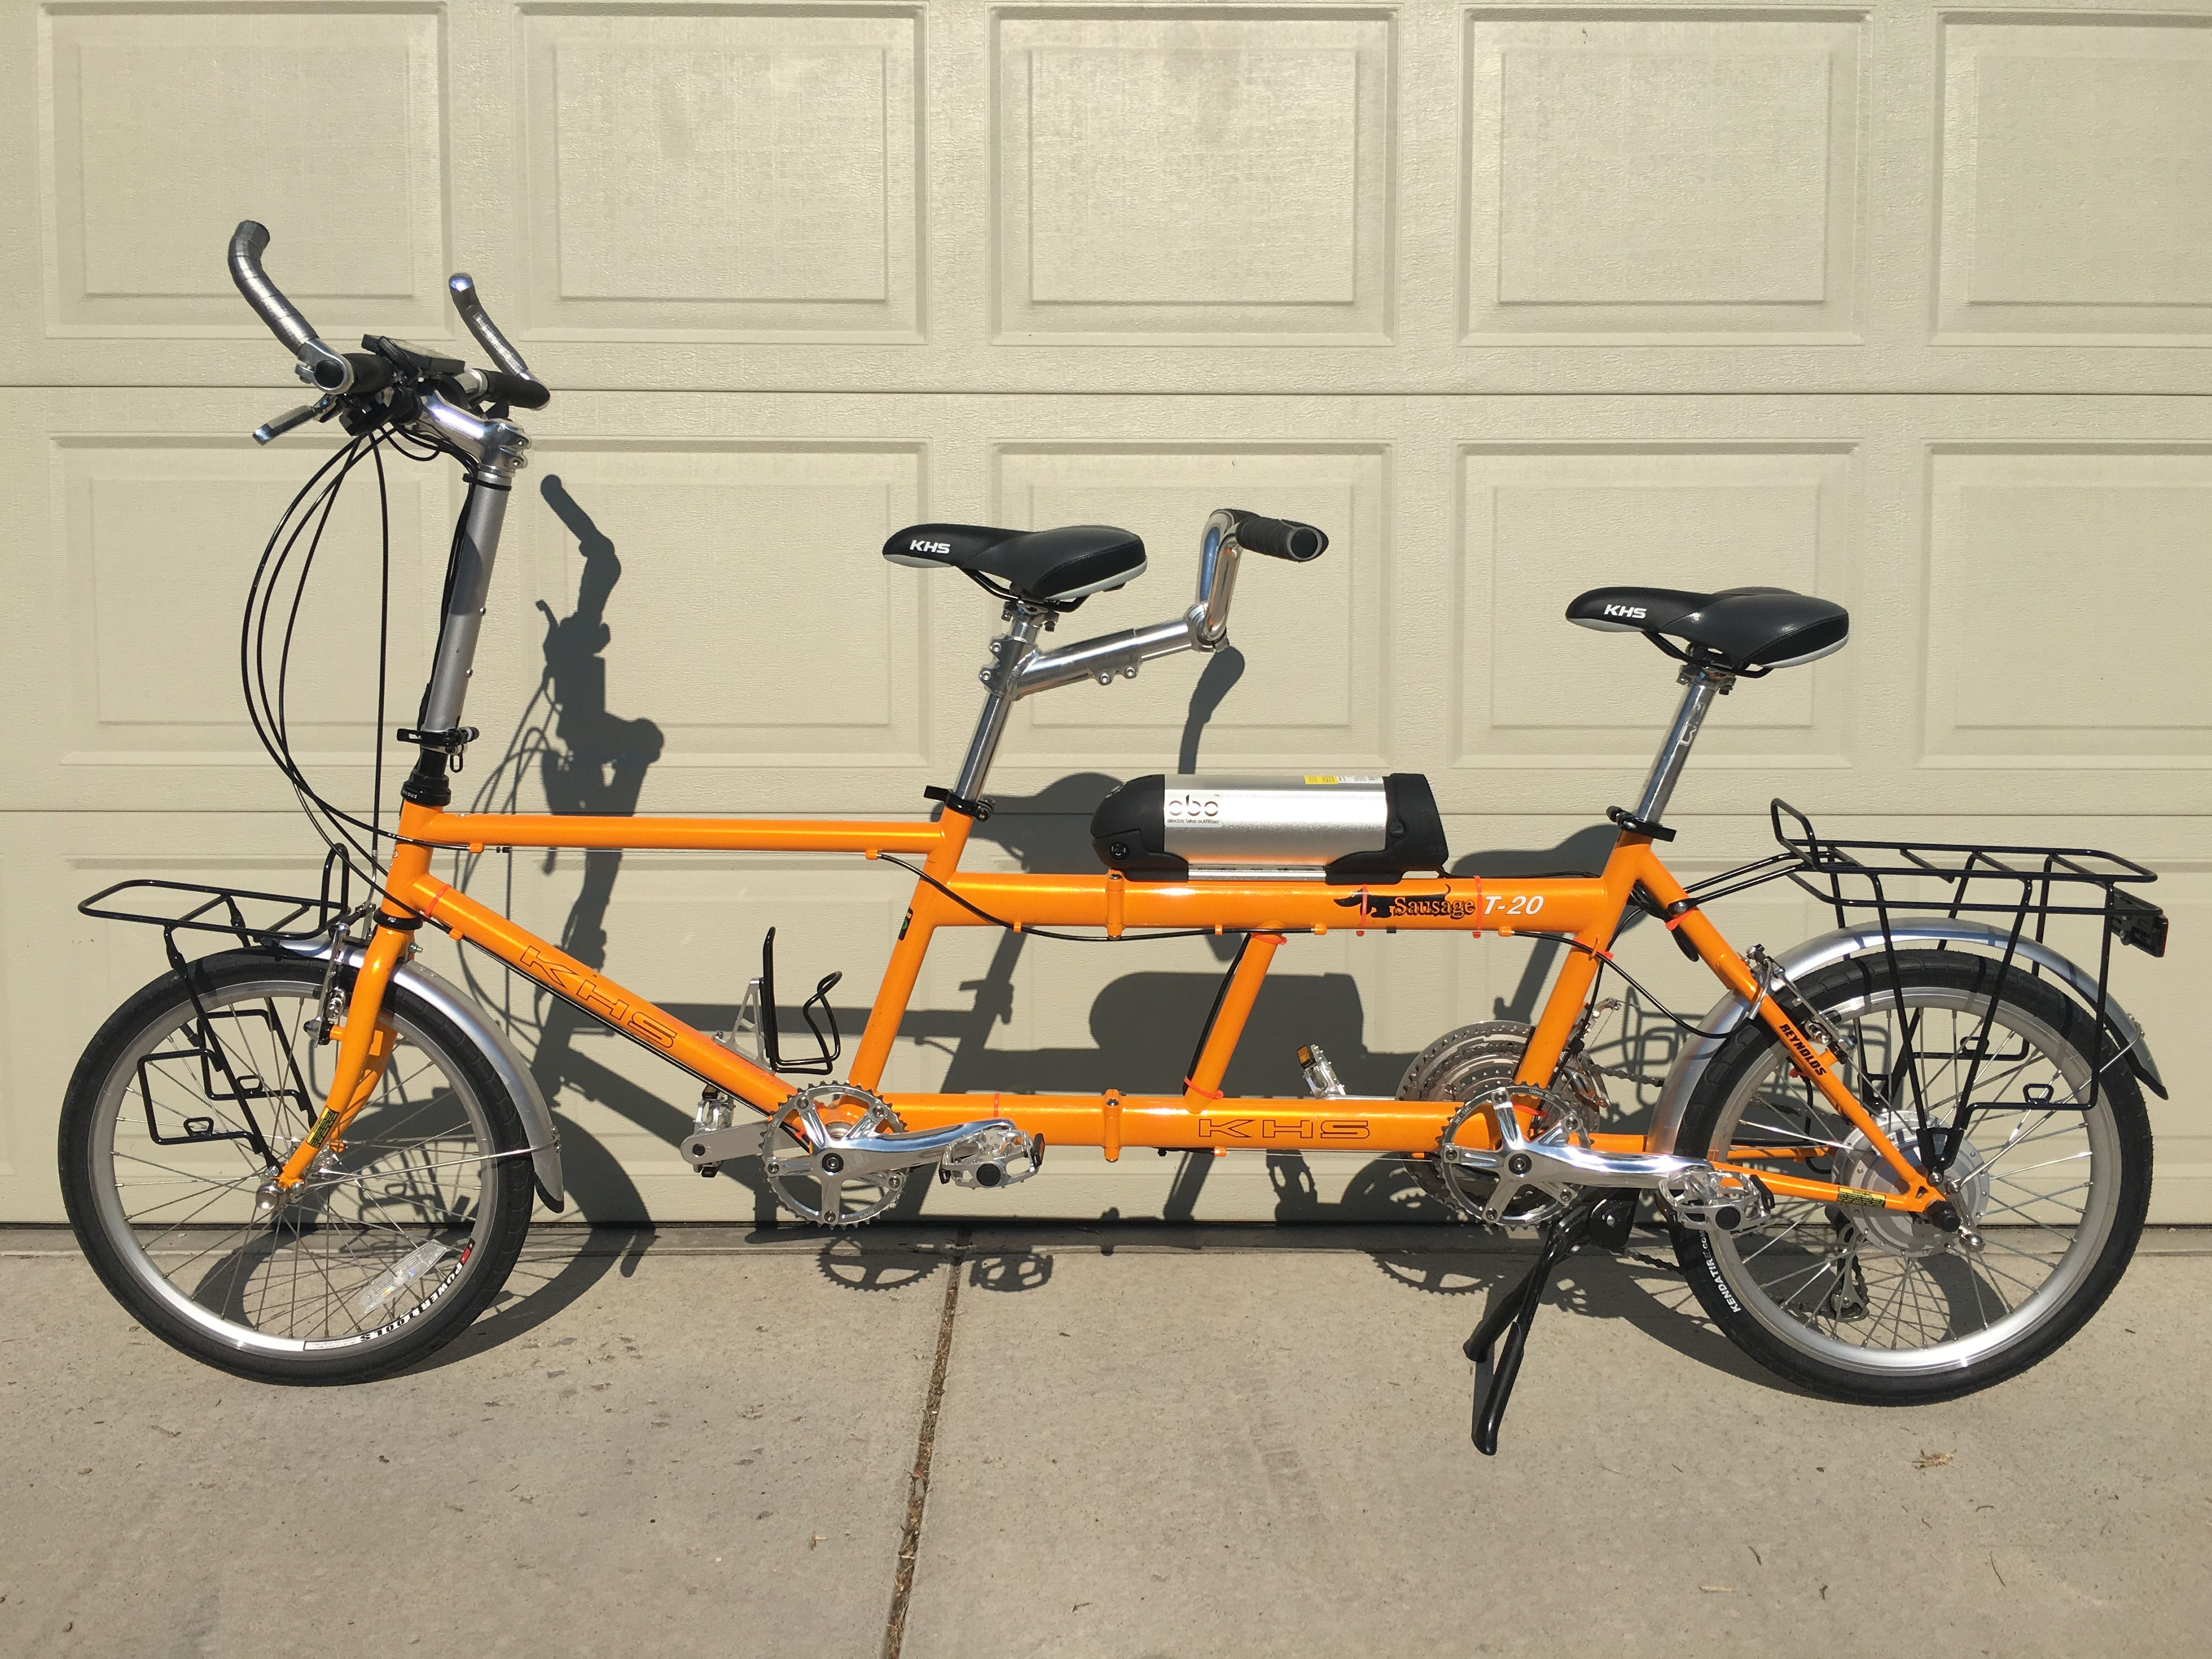 Ebo Phantom Electric Bike Kit Installed On A Khs T20 Sausage Dog Tandem Bike Kit Electric Bike Electric Bike Kits